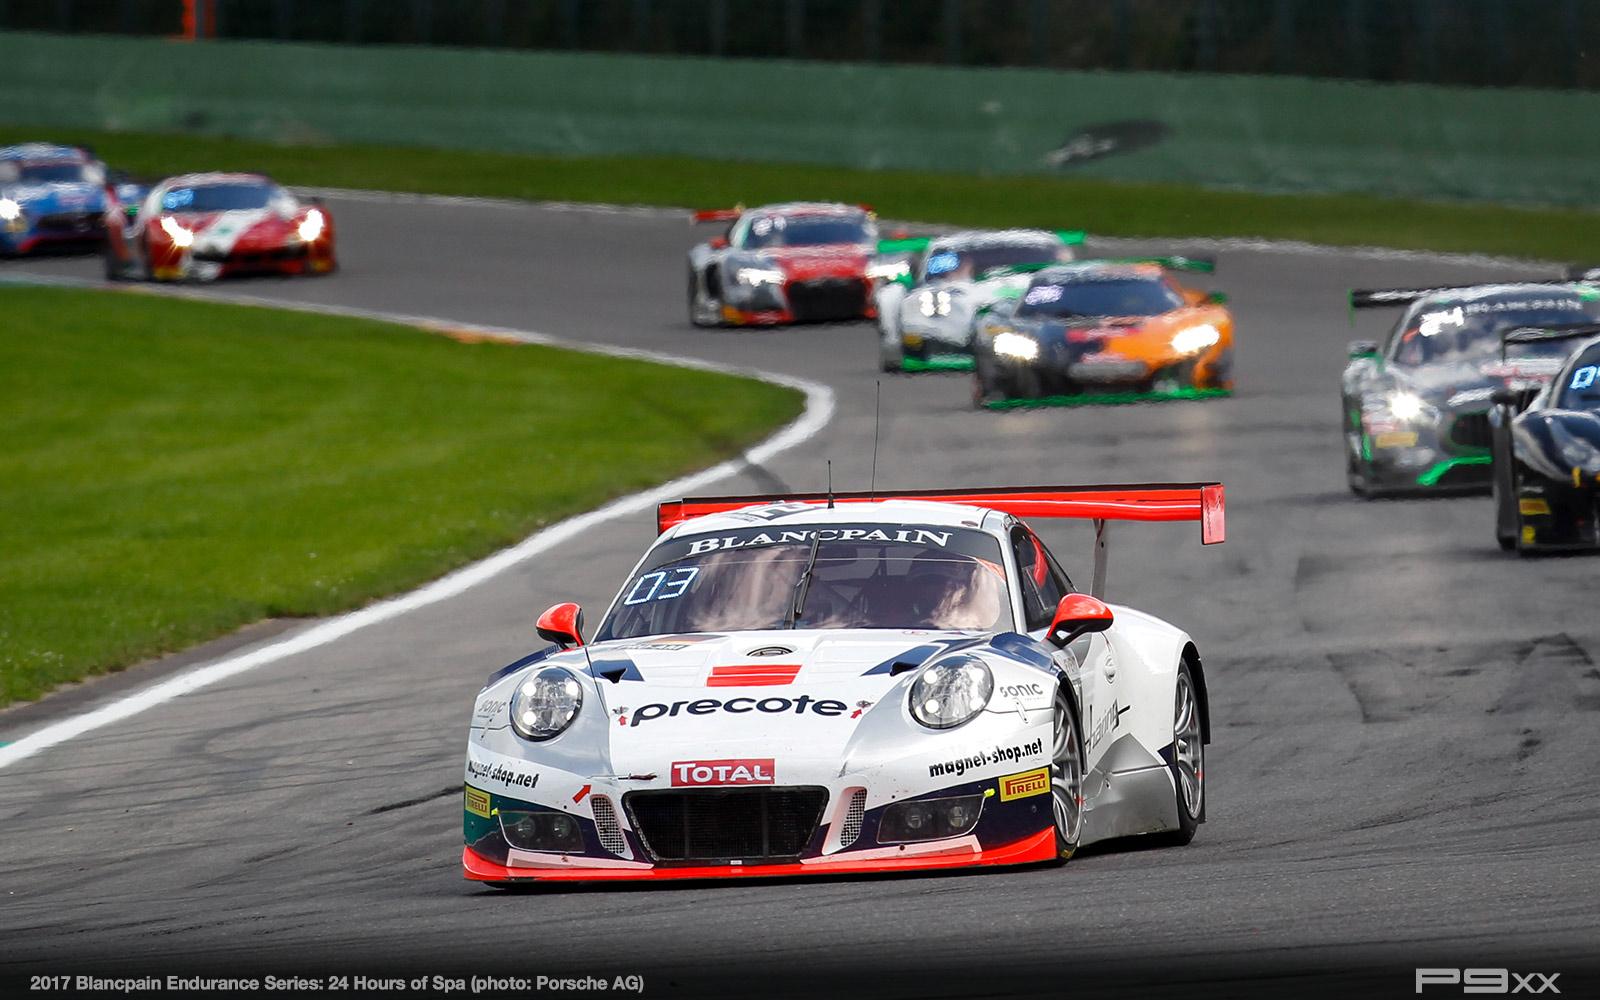 2017-24-Hours-of-Spa-Porsche-352